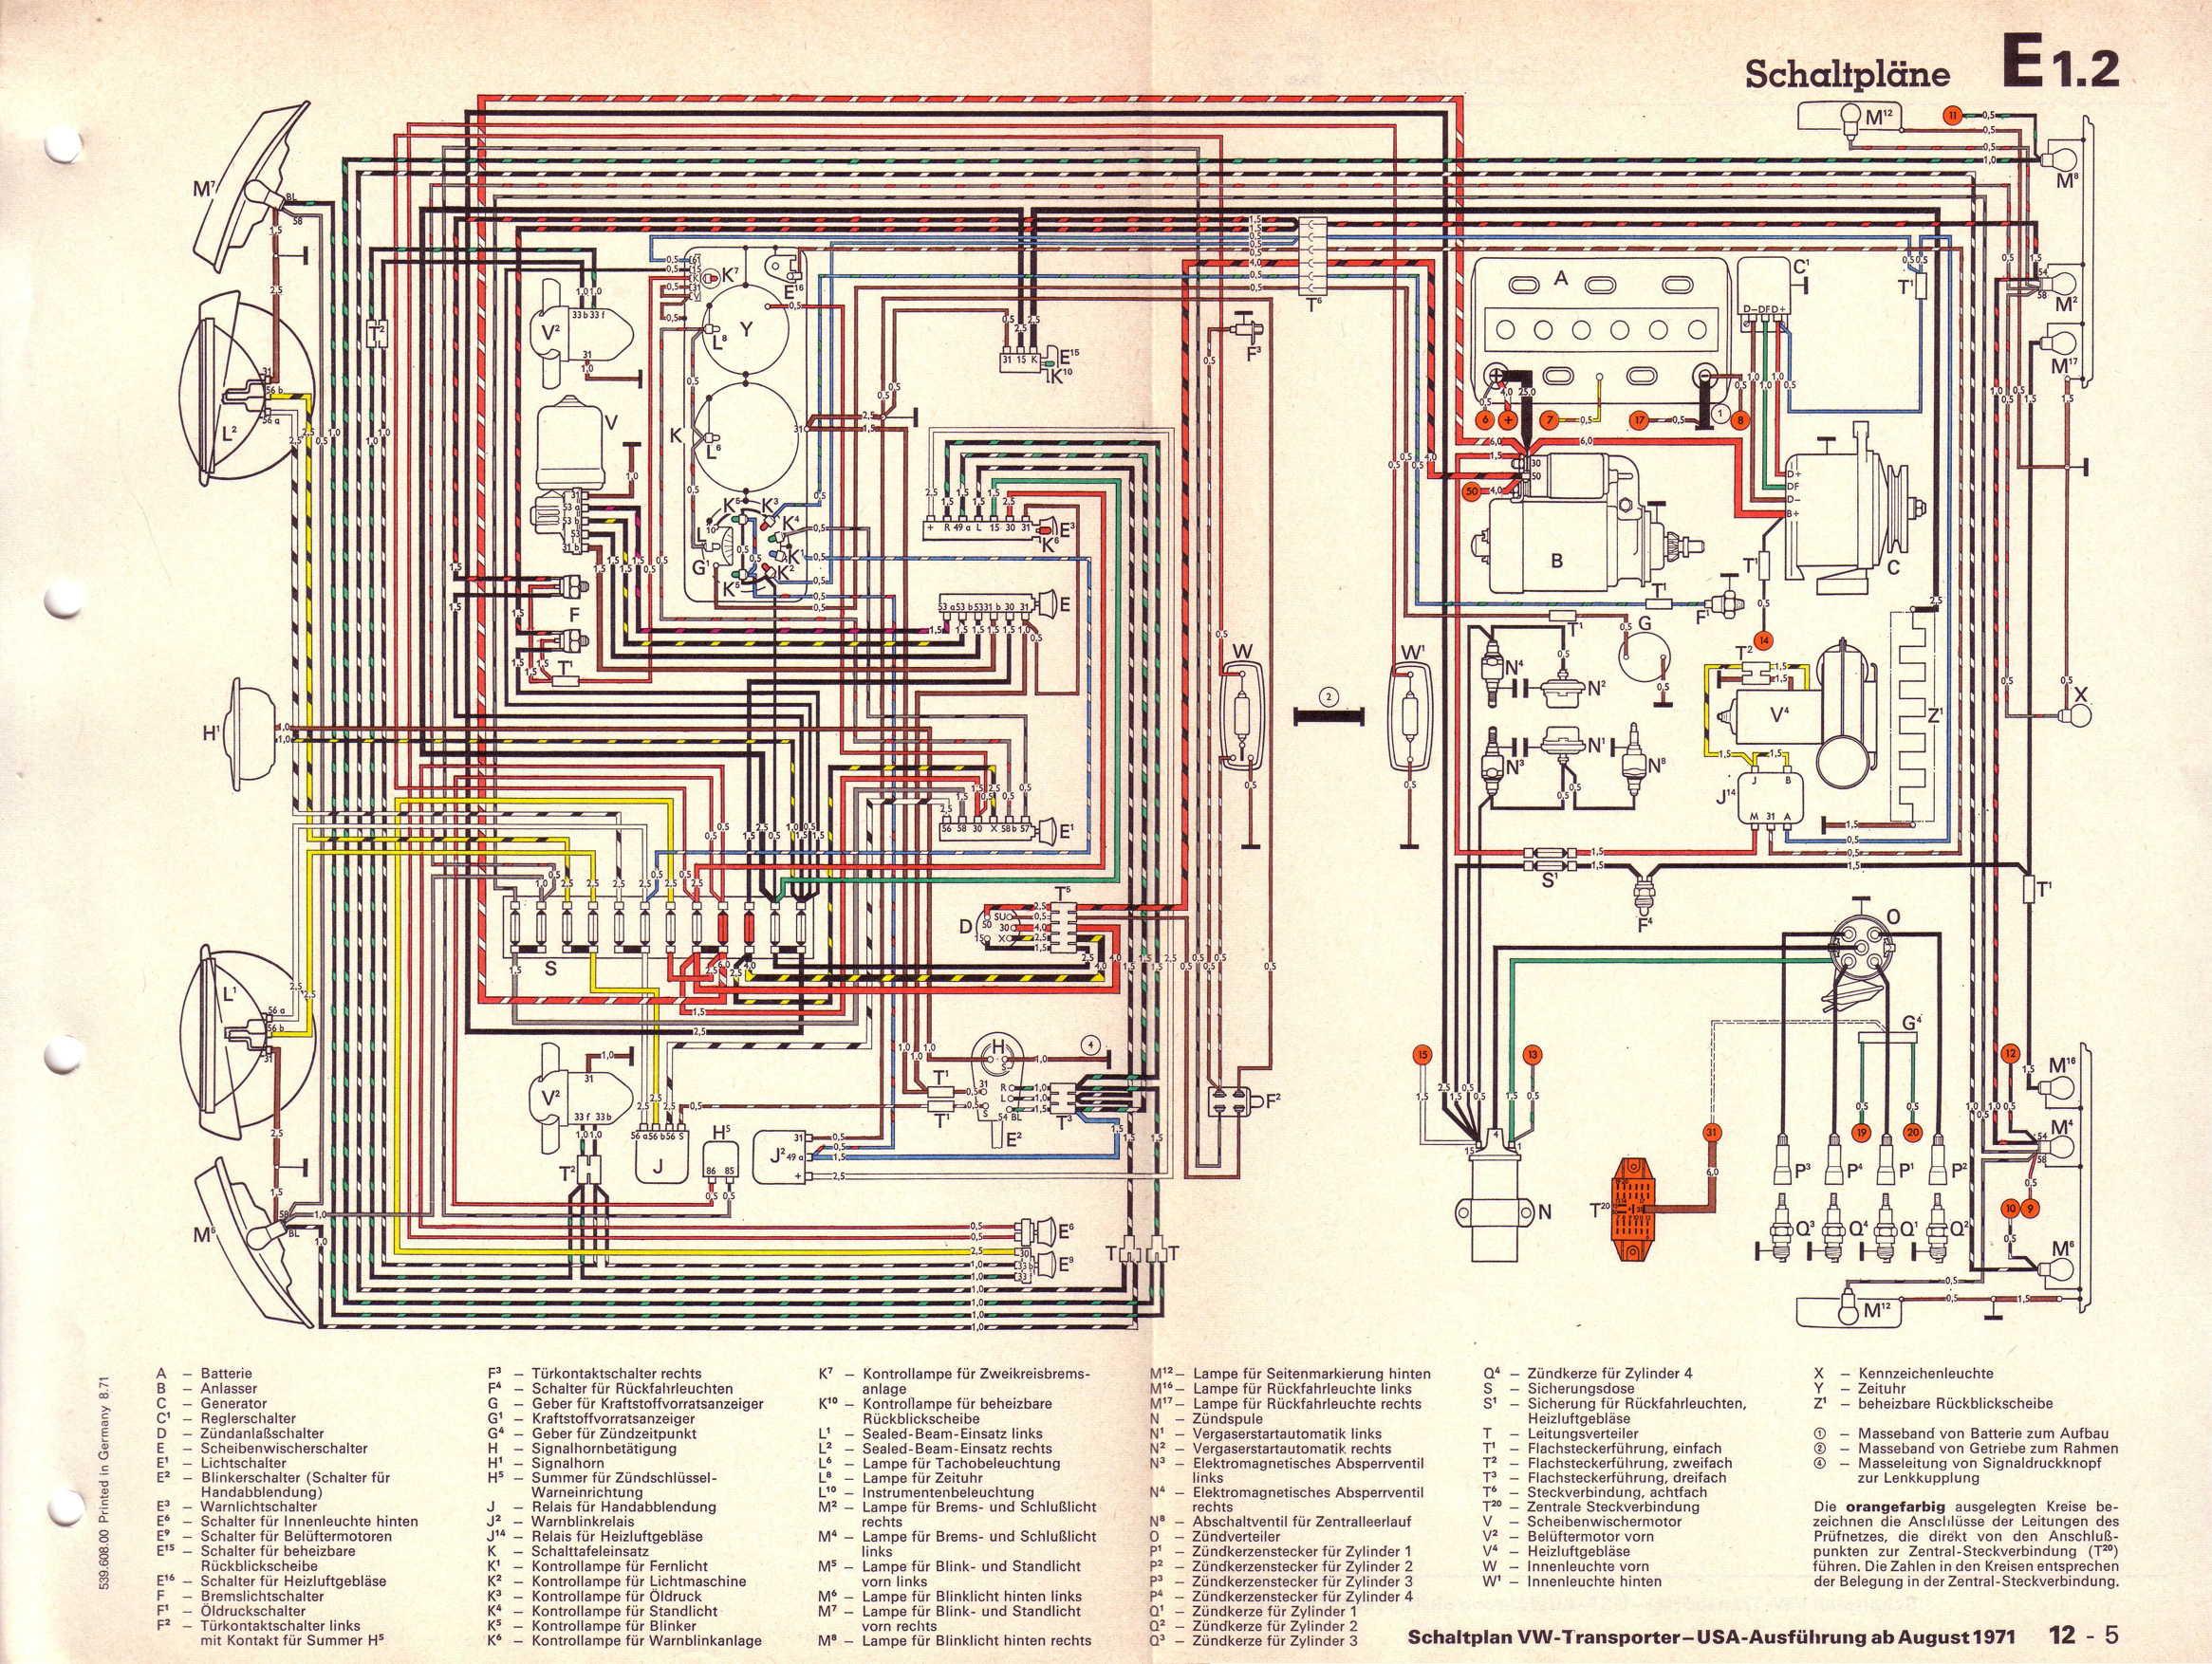 68 chevelle wiring diagram 68 chevelle wiring diagram wiring 68 Chevelle Wiring Diagram Start Neteral 1968